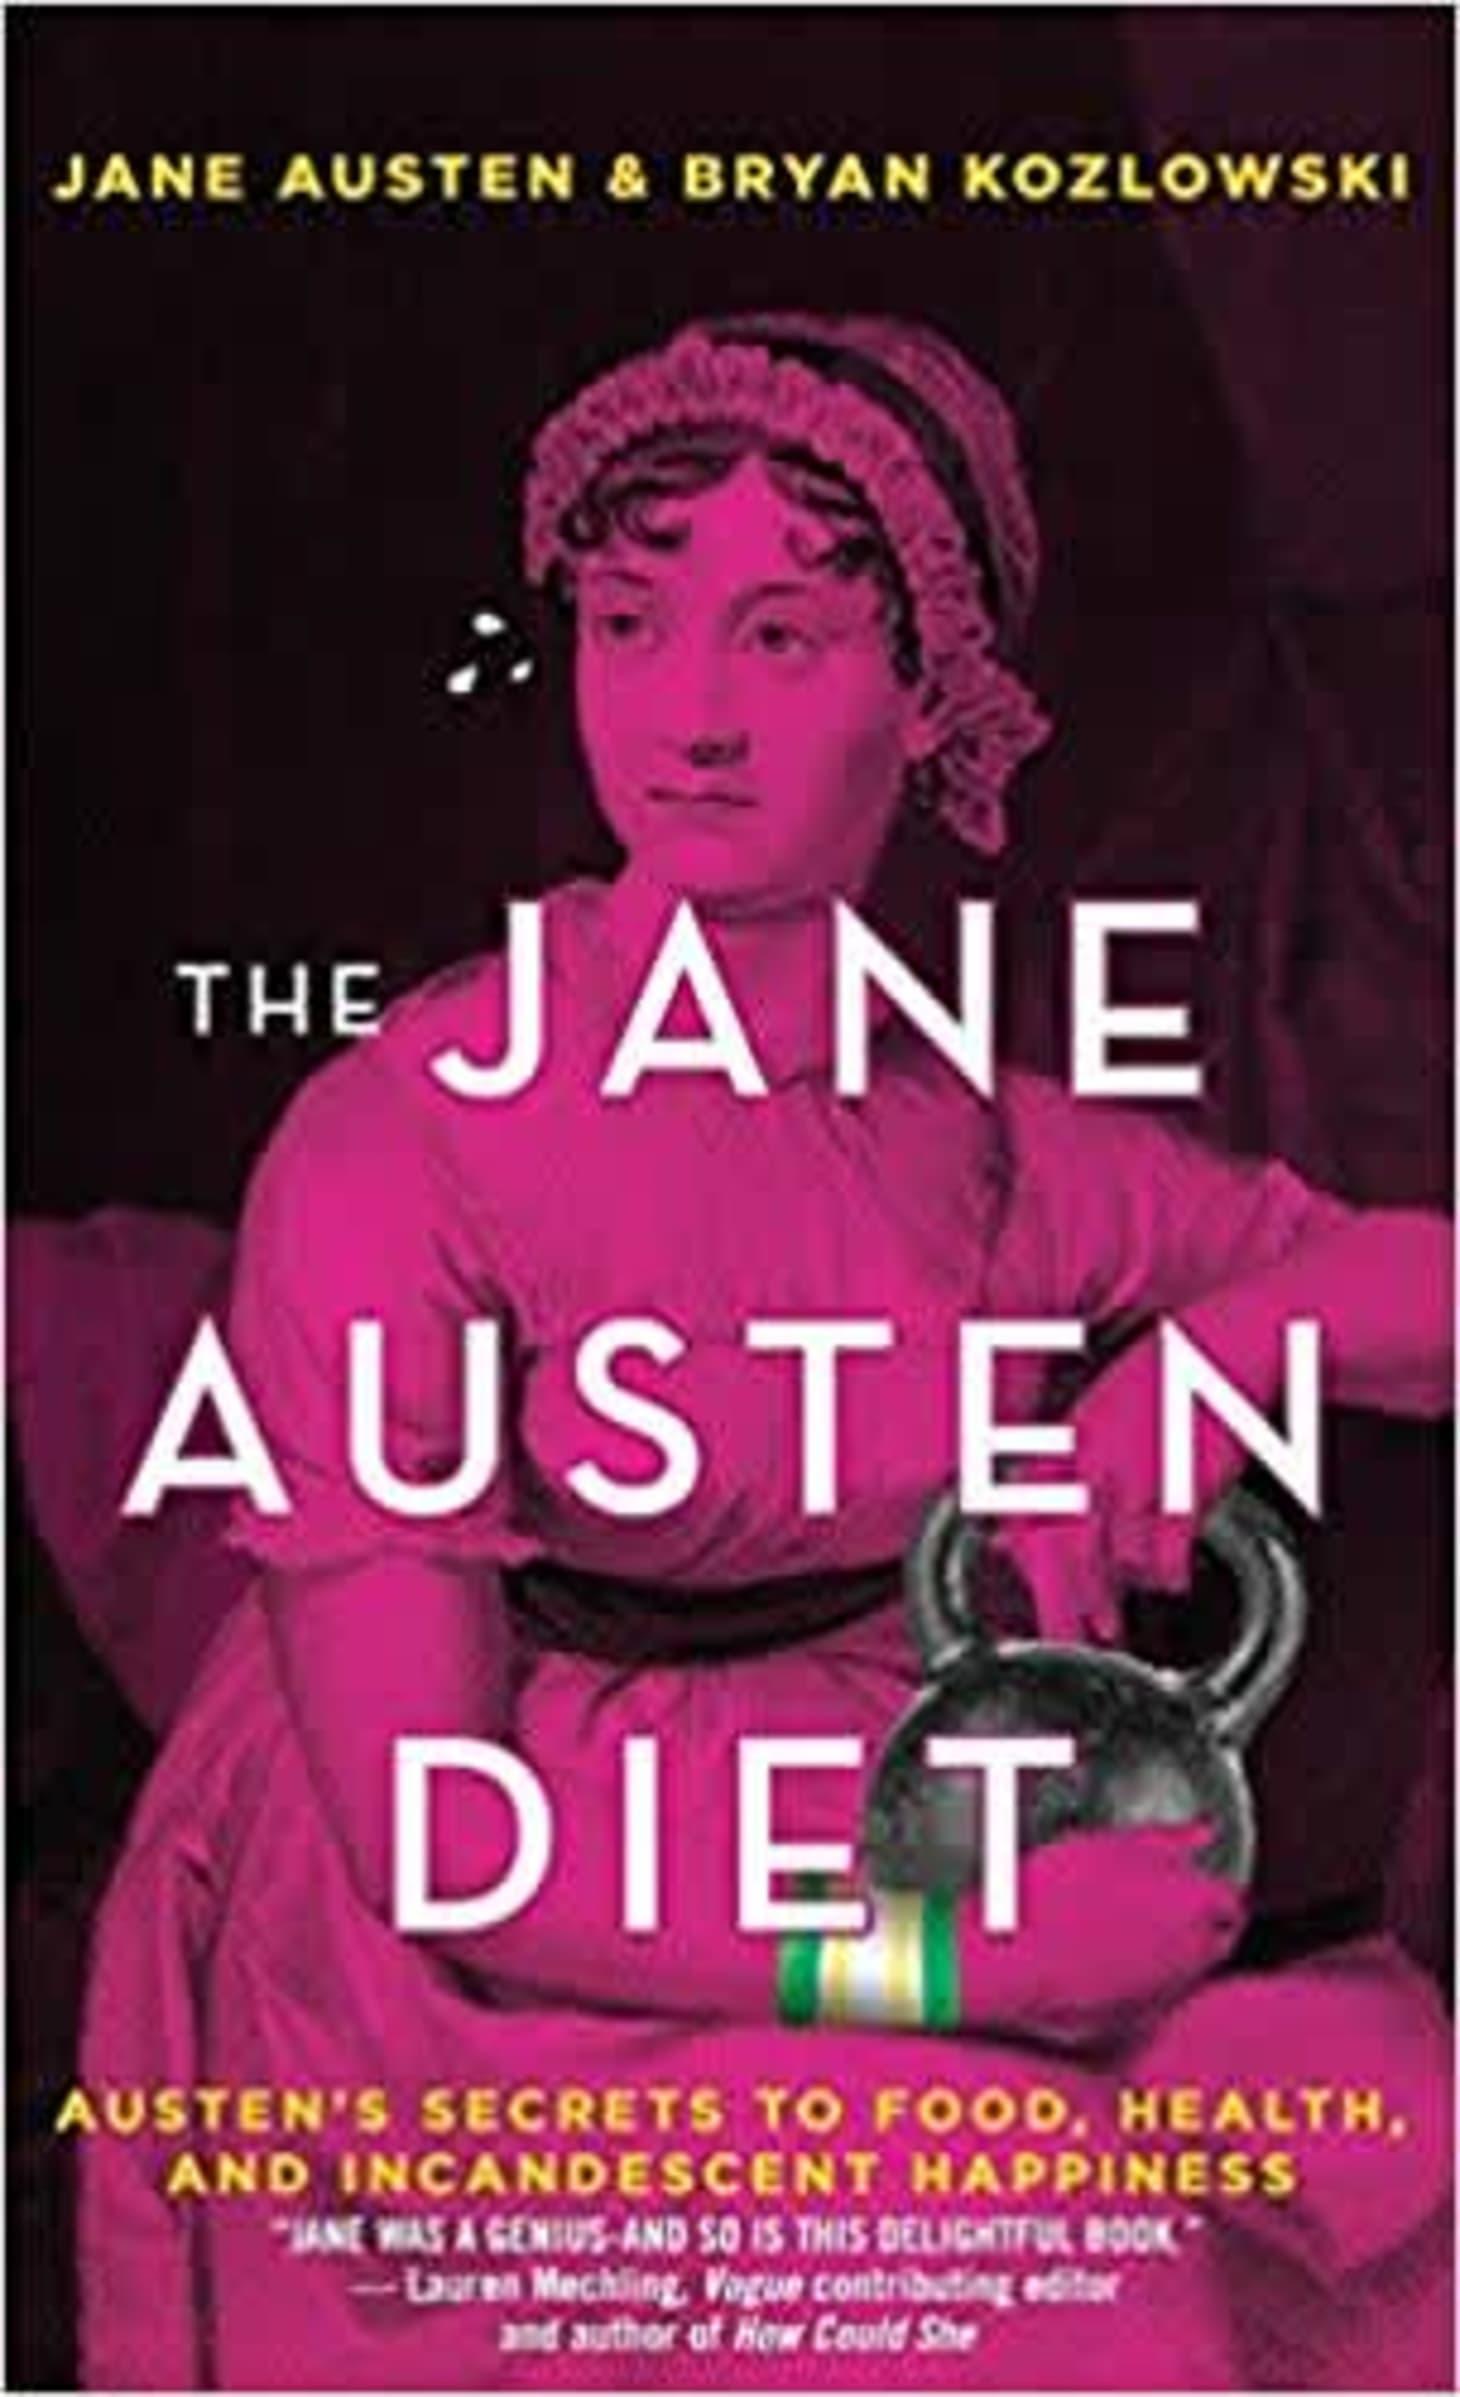 6 Things That Prove Jane Austen Was the Wellness Guru of Her